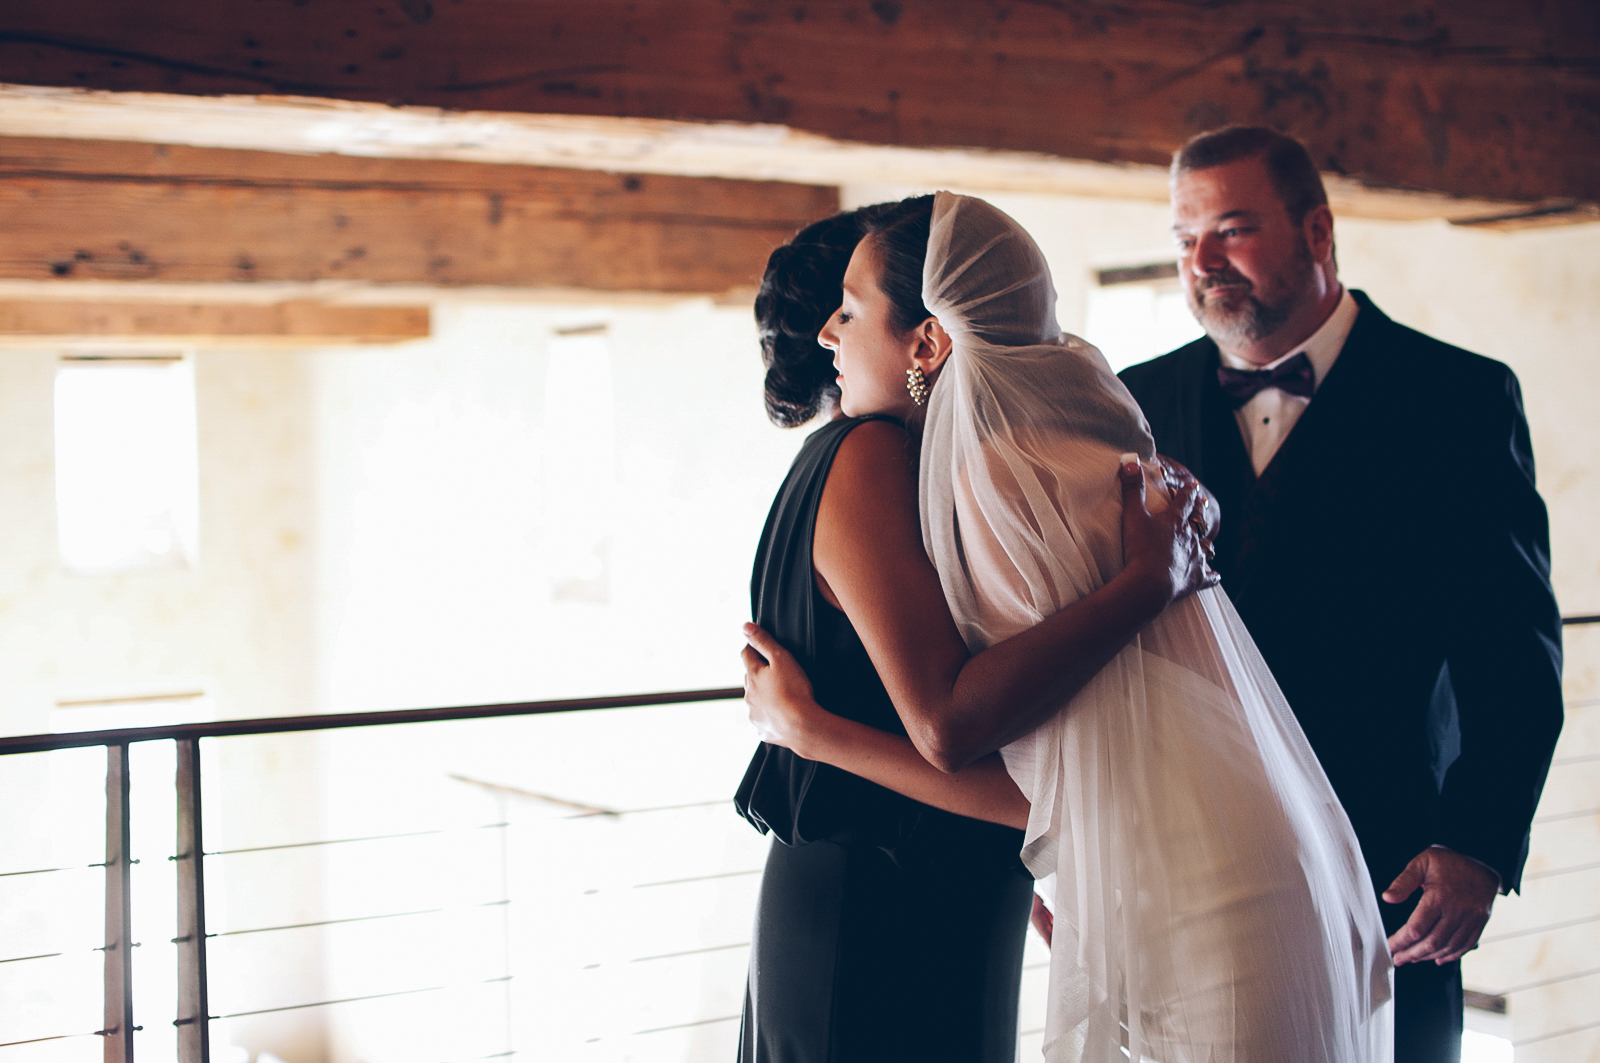 miraflores_winery_wedding_photography_ian_melissa_ebony_siovhan_bokeh_photography_16.jpg